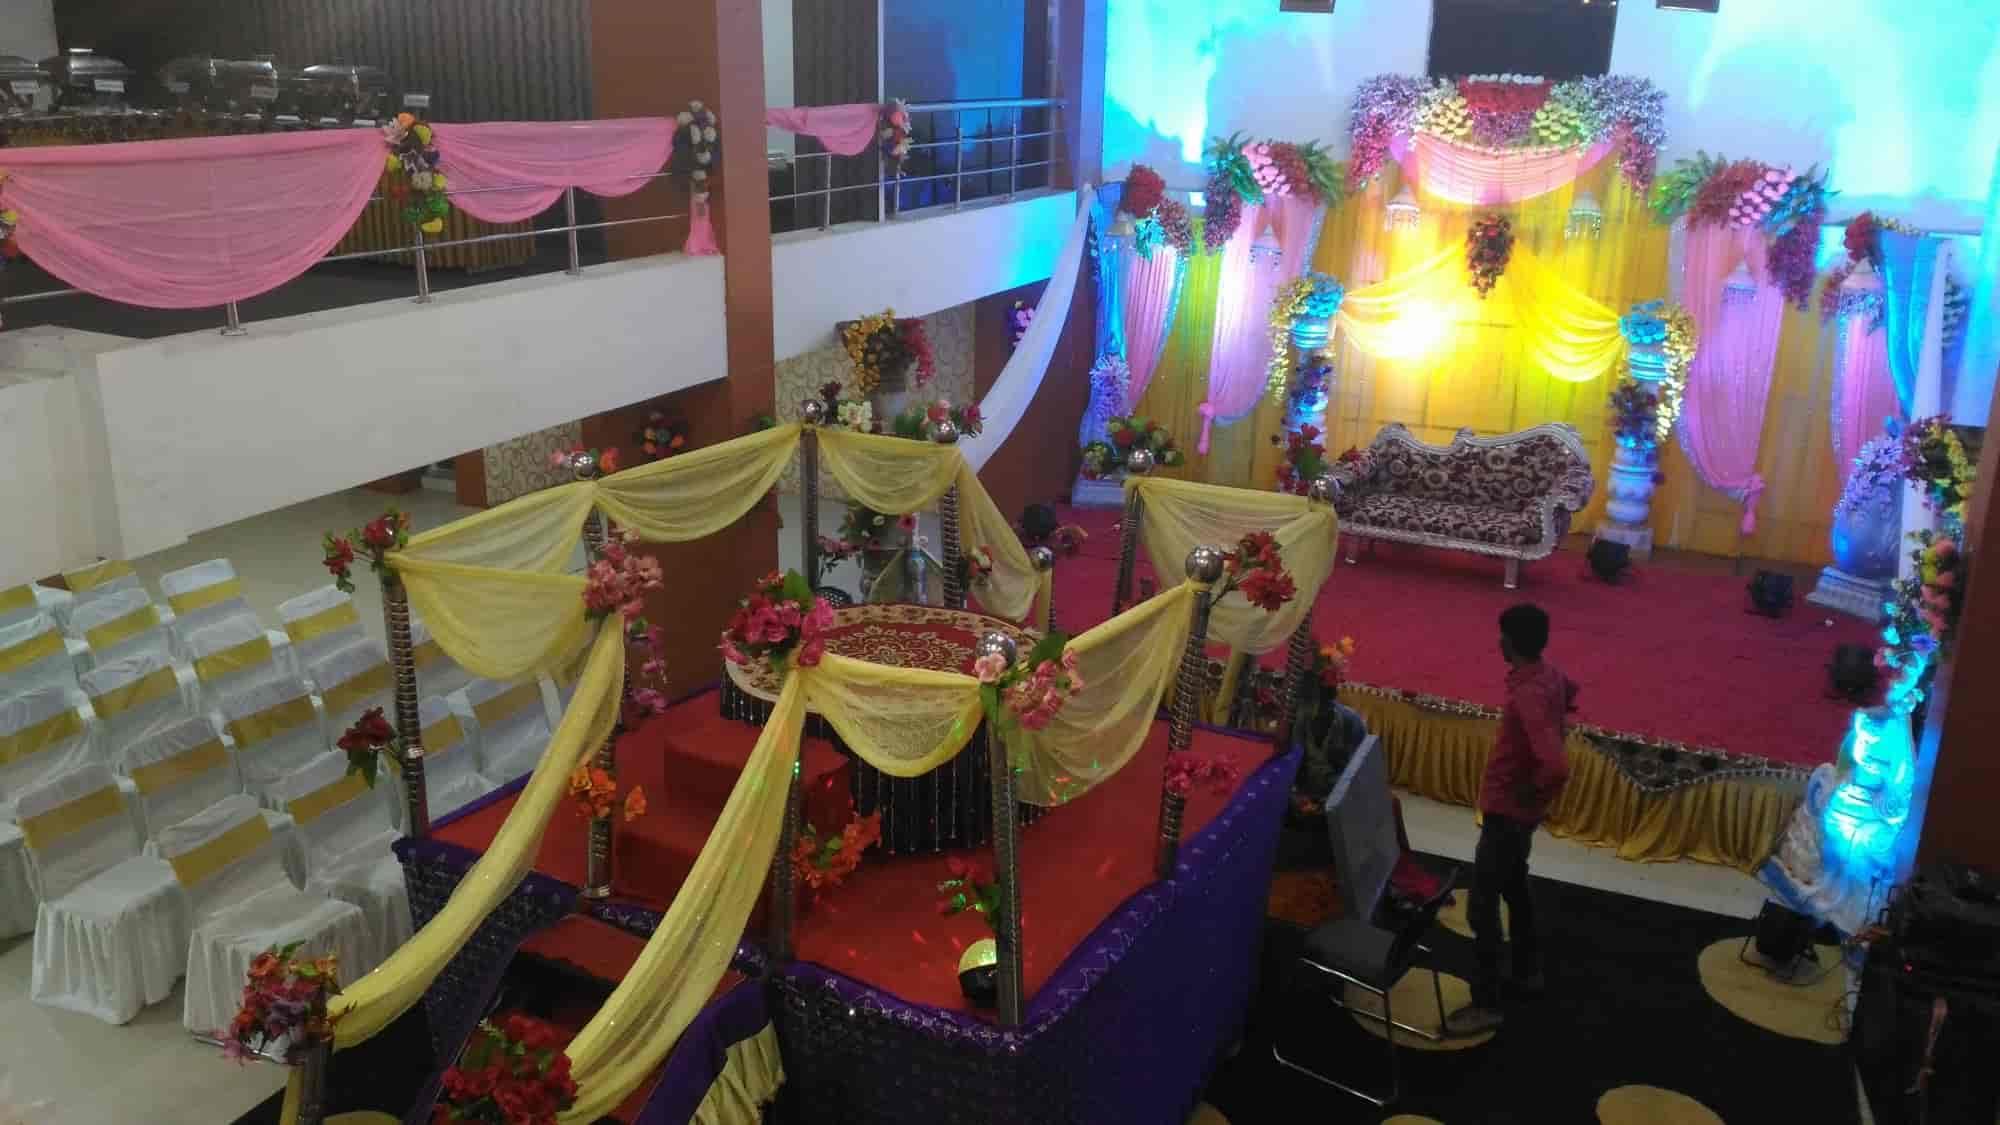 Hotel Grand Celebration M Kachhuara Hotels In Patna Justdial